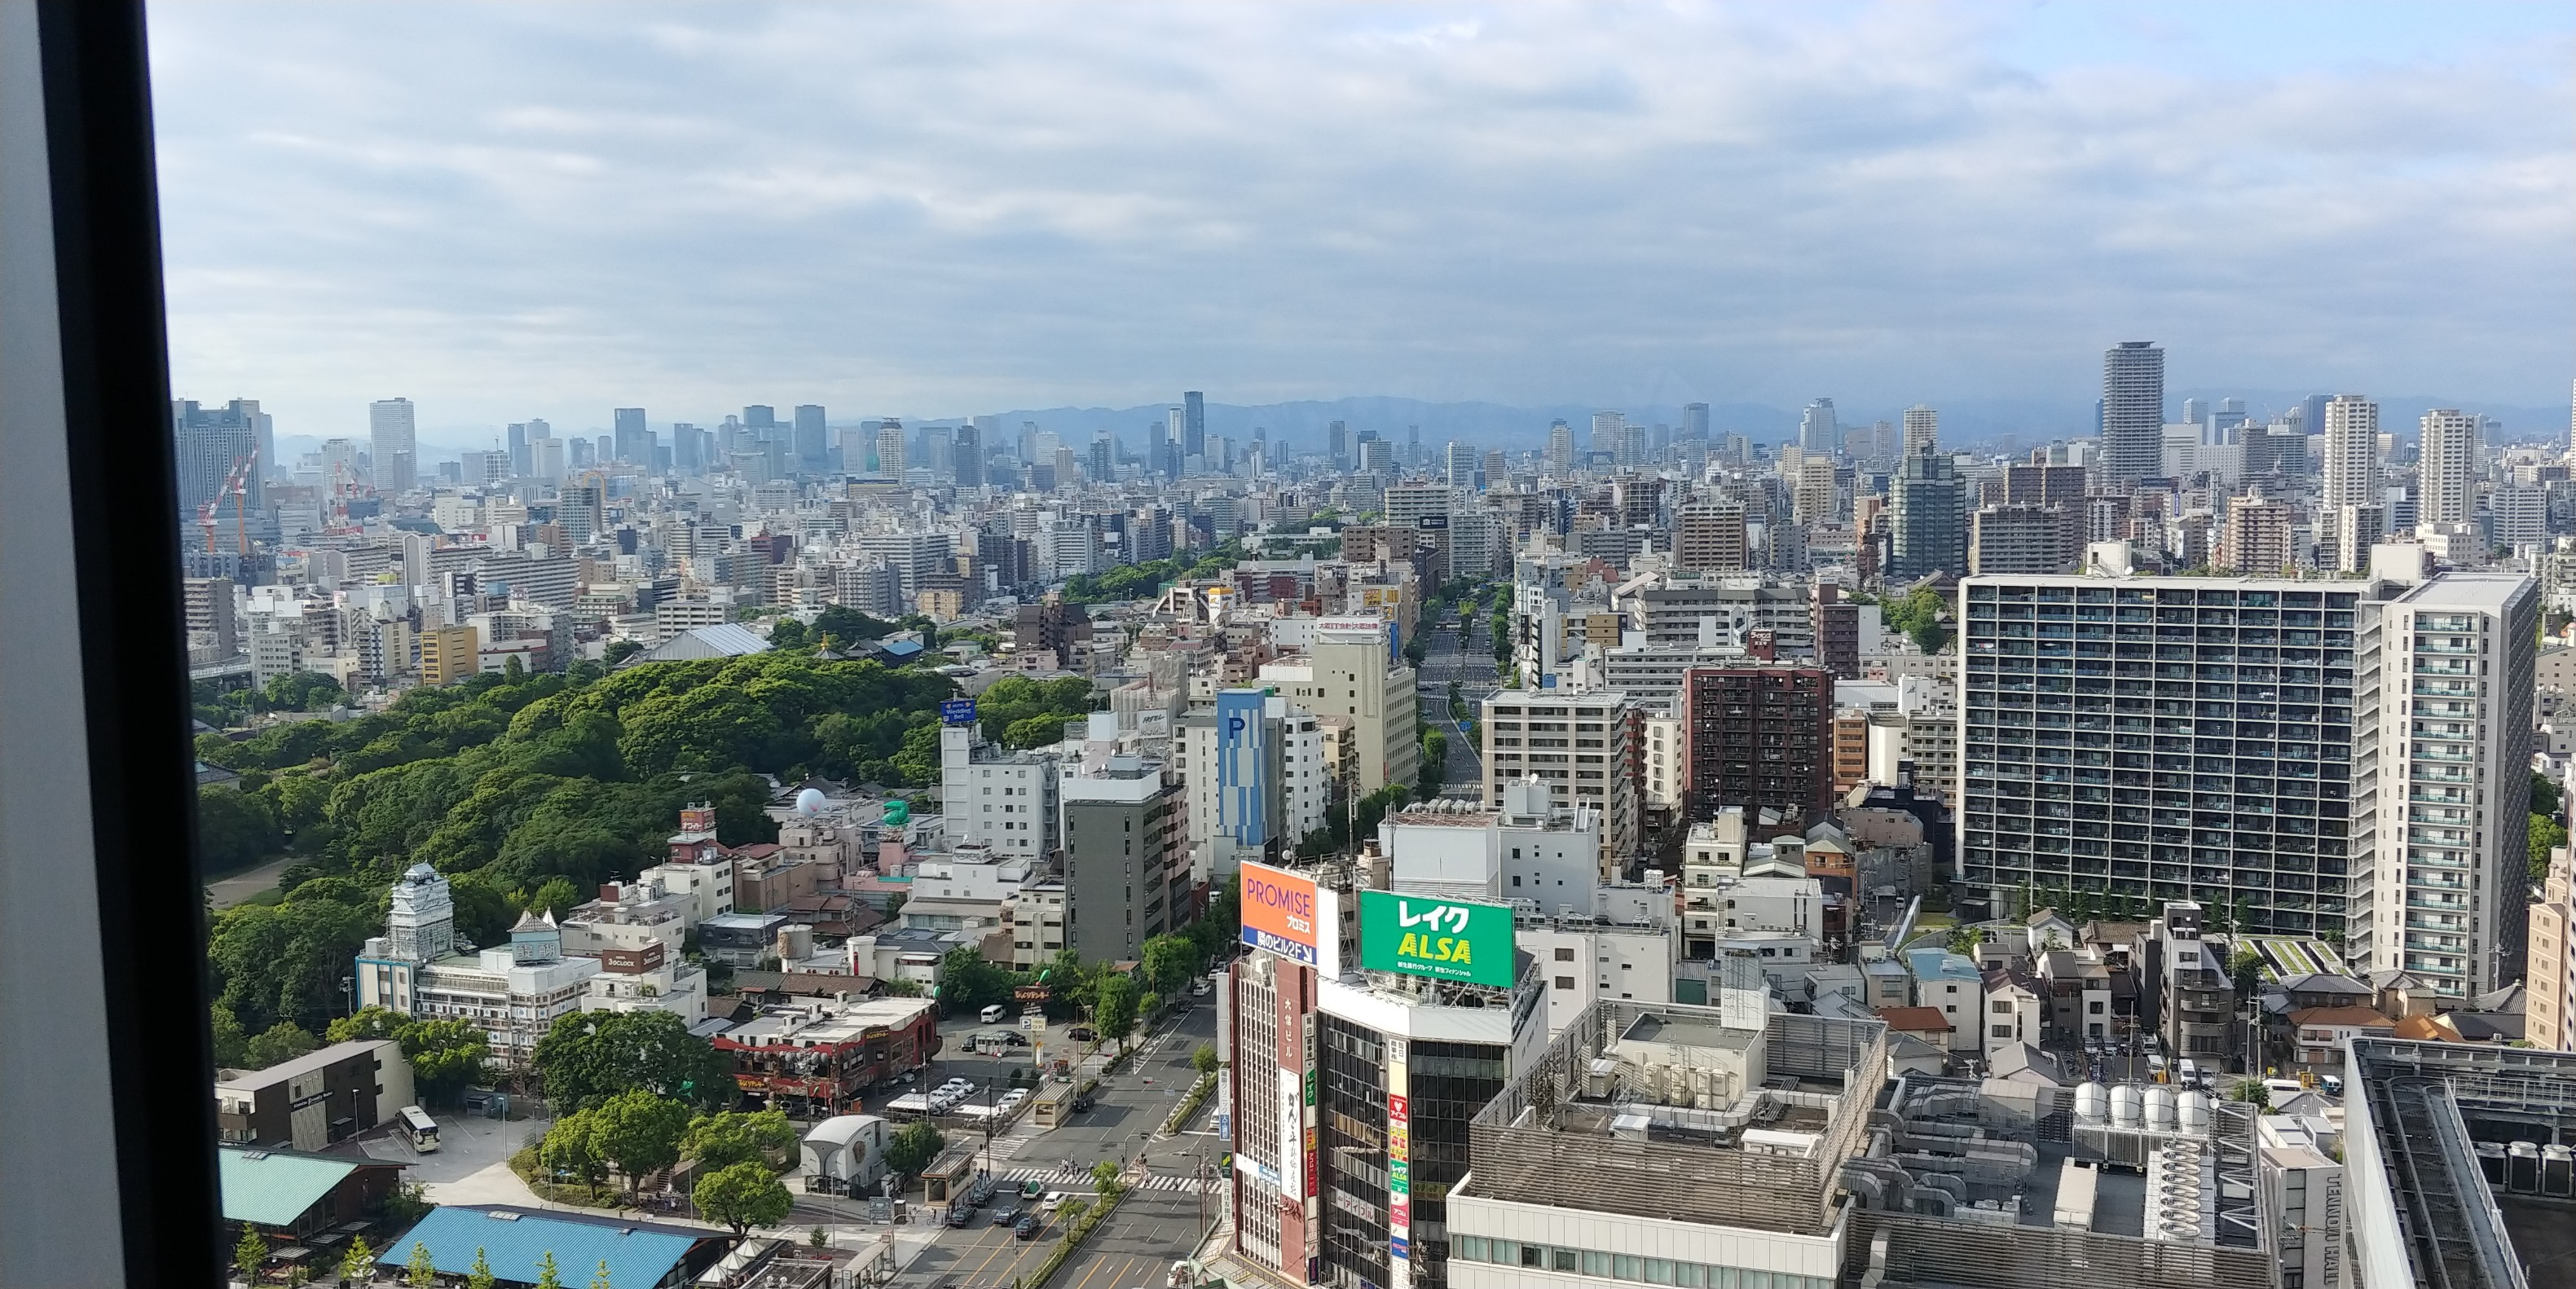 f:id:kishuji-kaisoku:20200122054802j:image